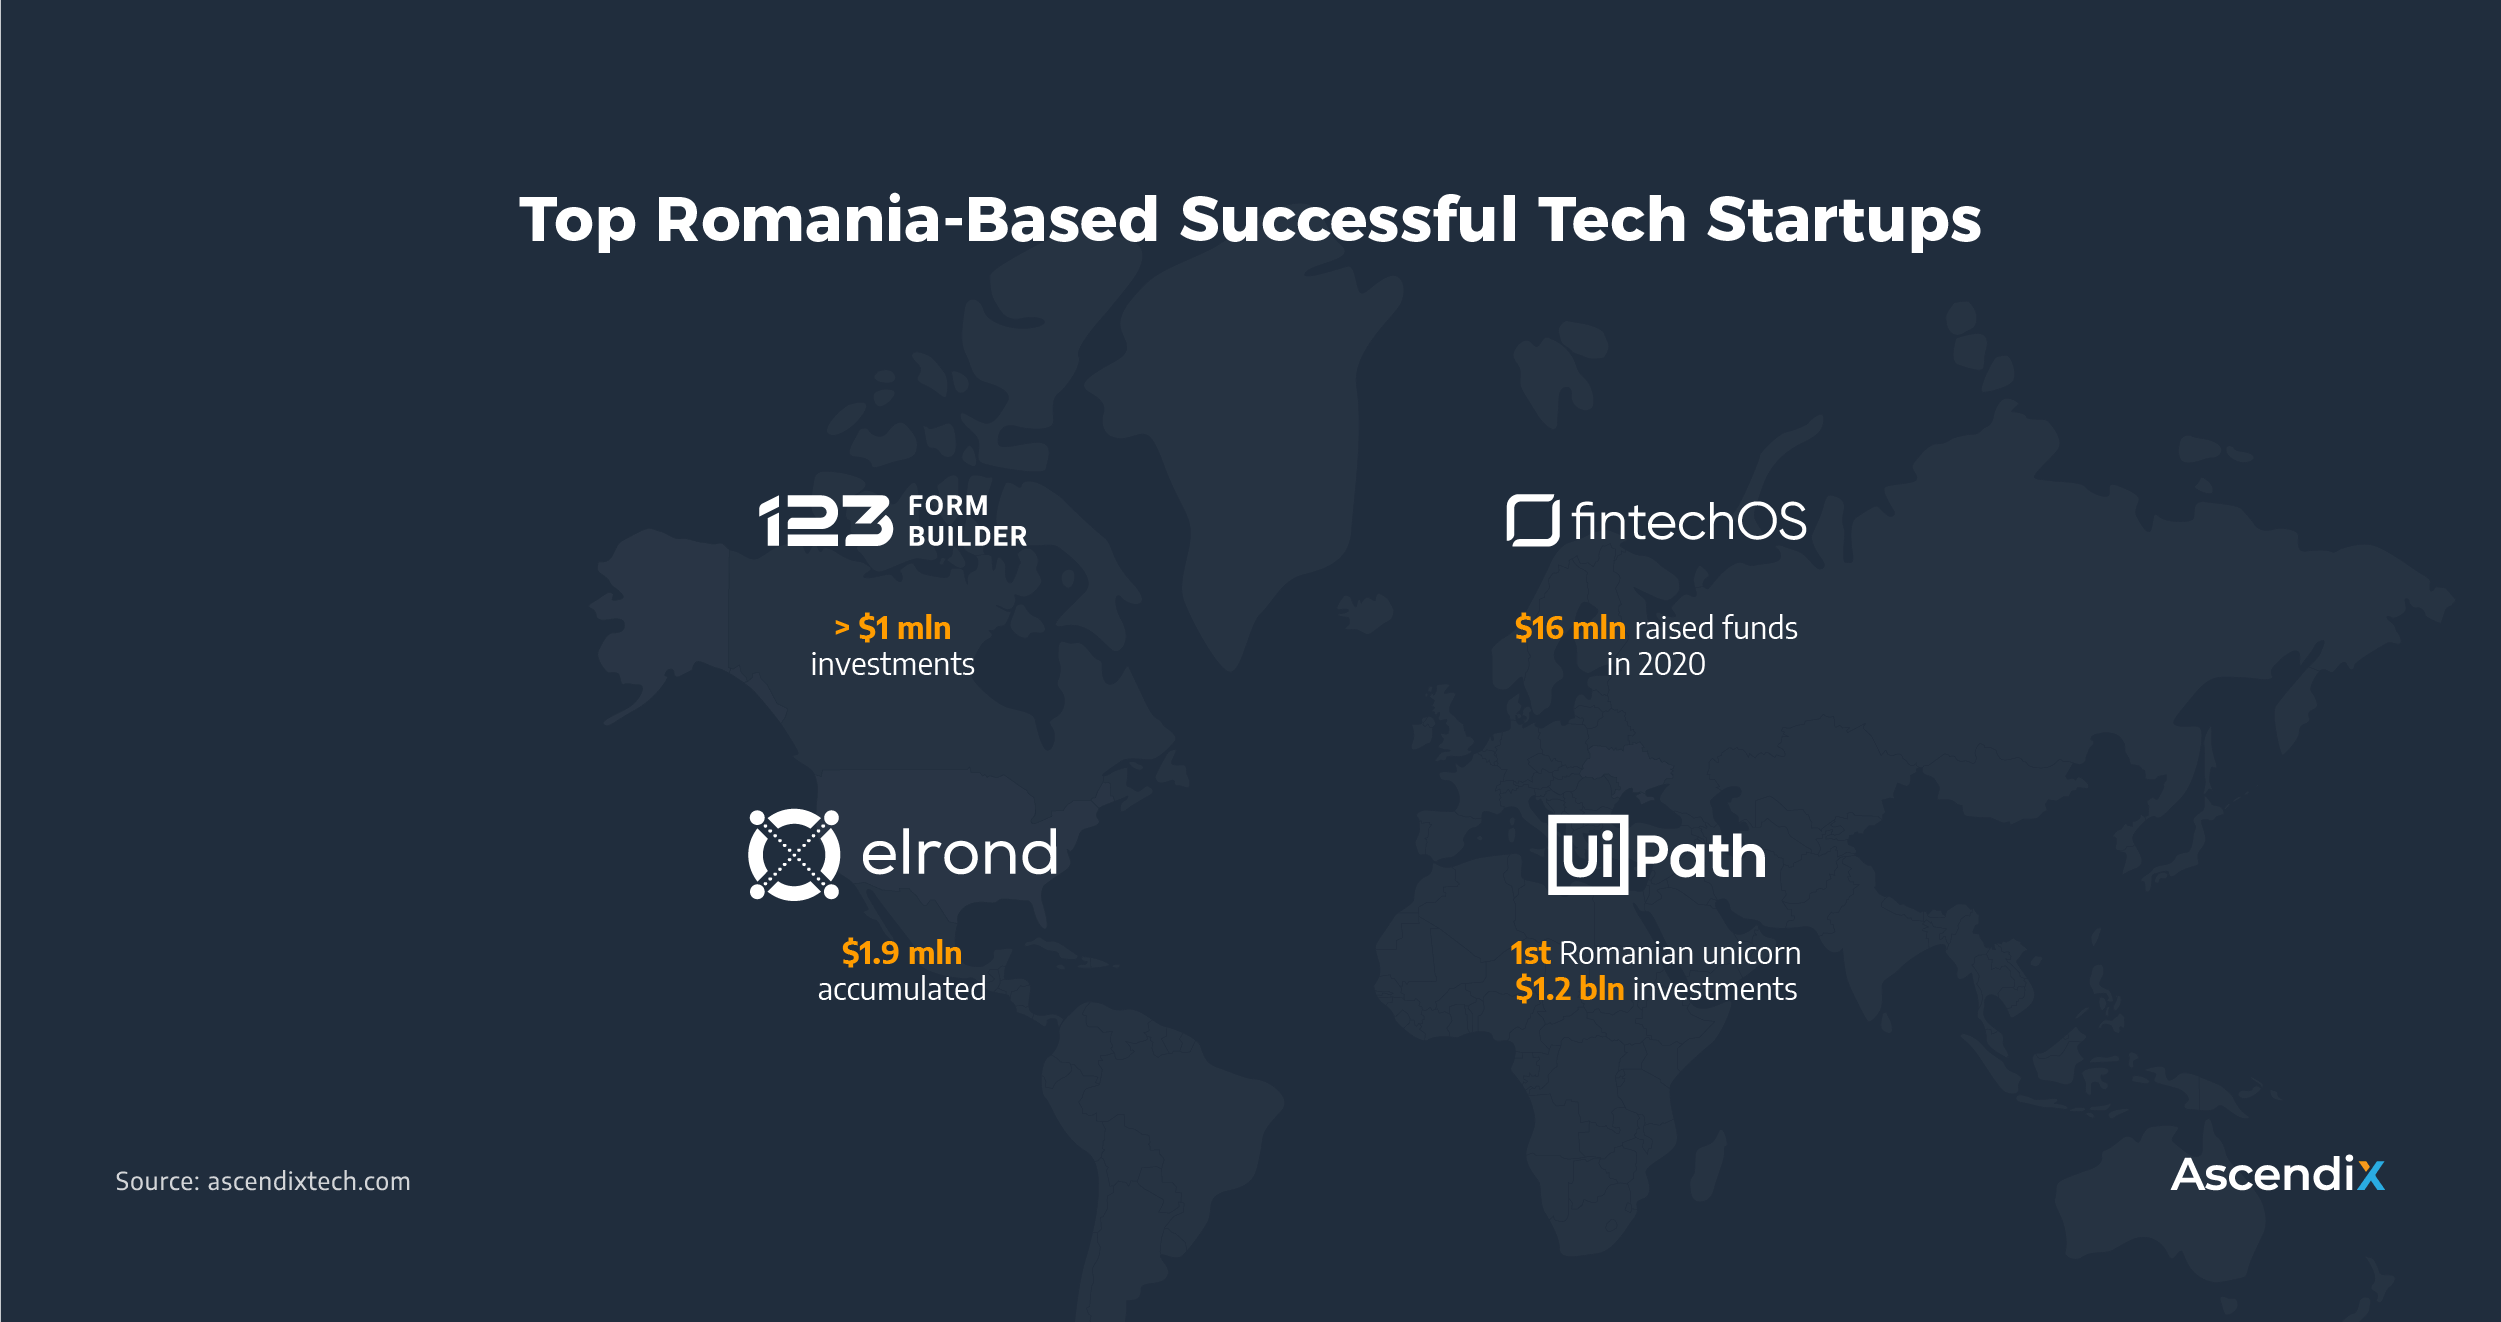 Top Romania-Based Successful Tech Startups | Ascendix Tech